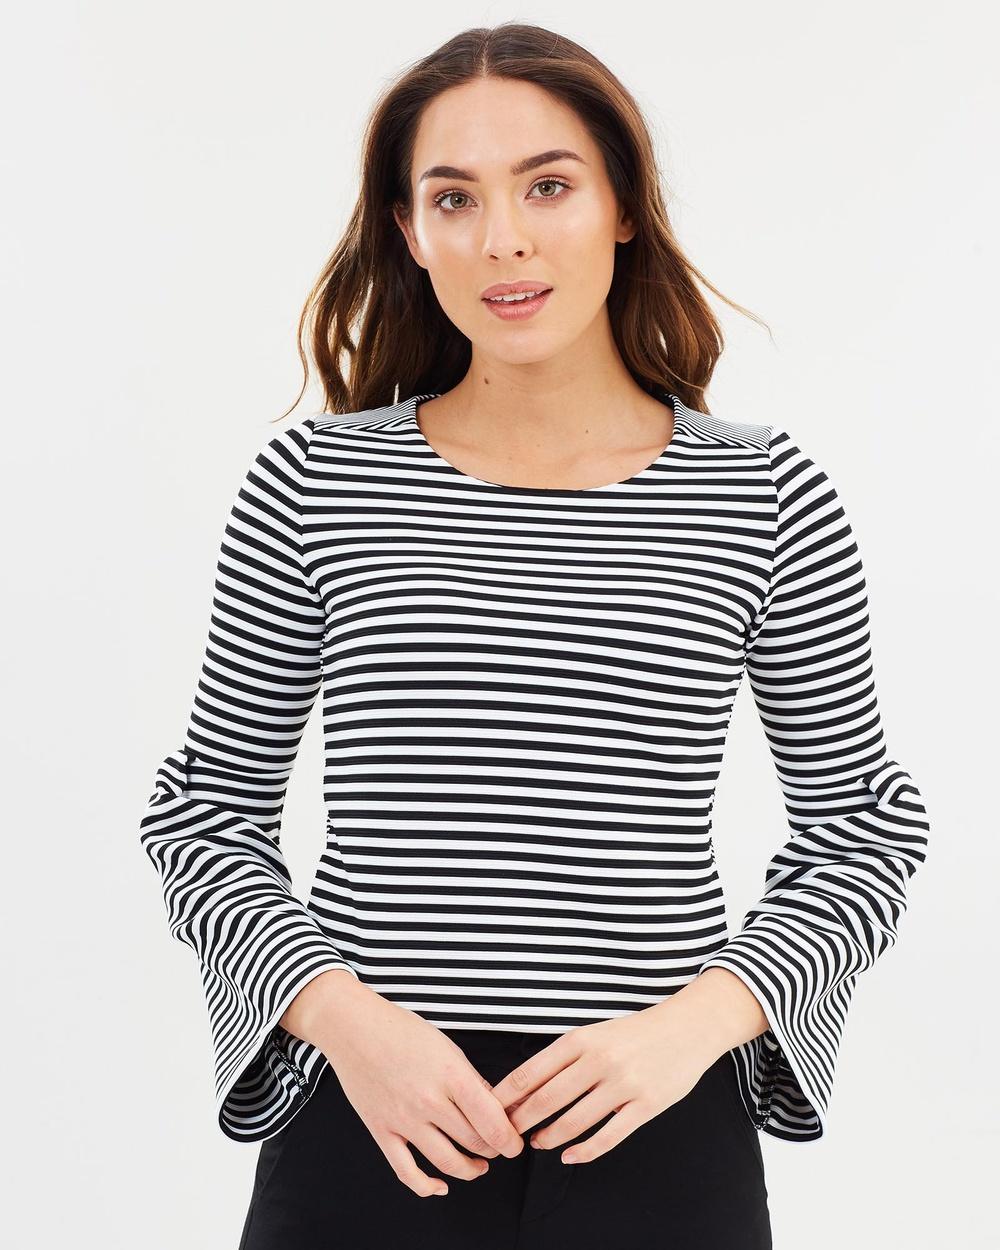 Karen Millen Flared Sleeve Top Tops Black & White Flared Sleeve Top